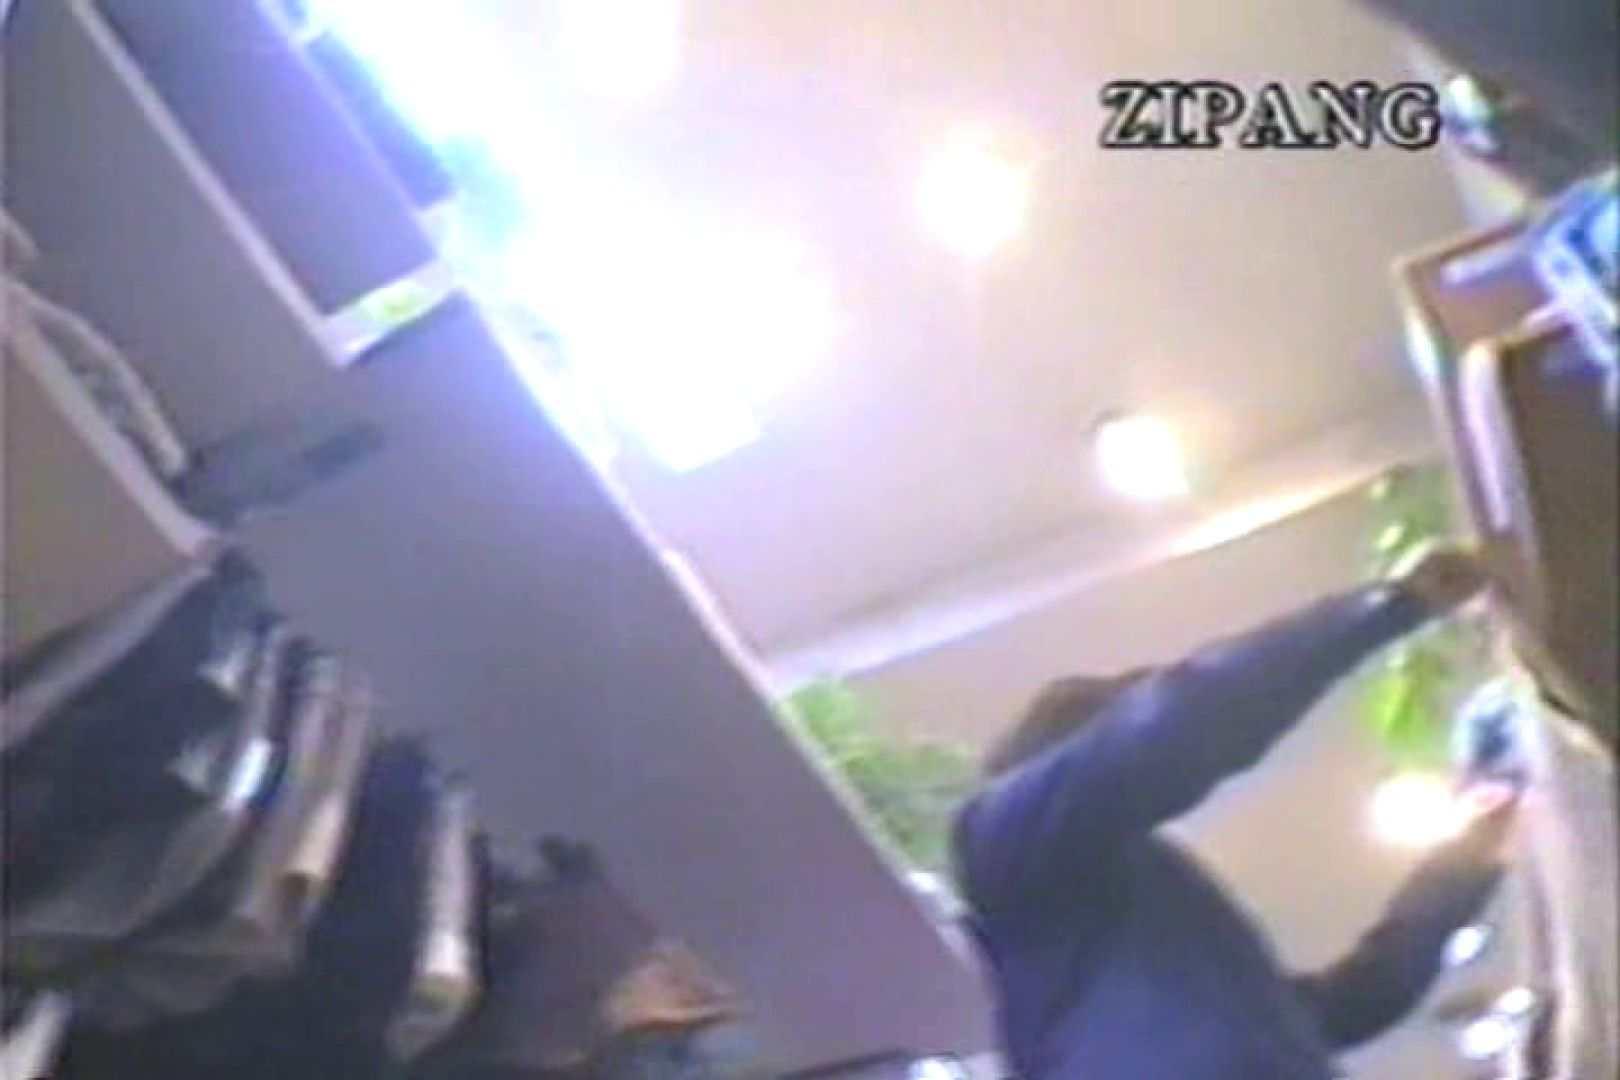 盗撮 女子大生生パン大特集nn4 女子大生 盗撮セックス無修正動画無料 52pic 29